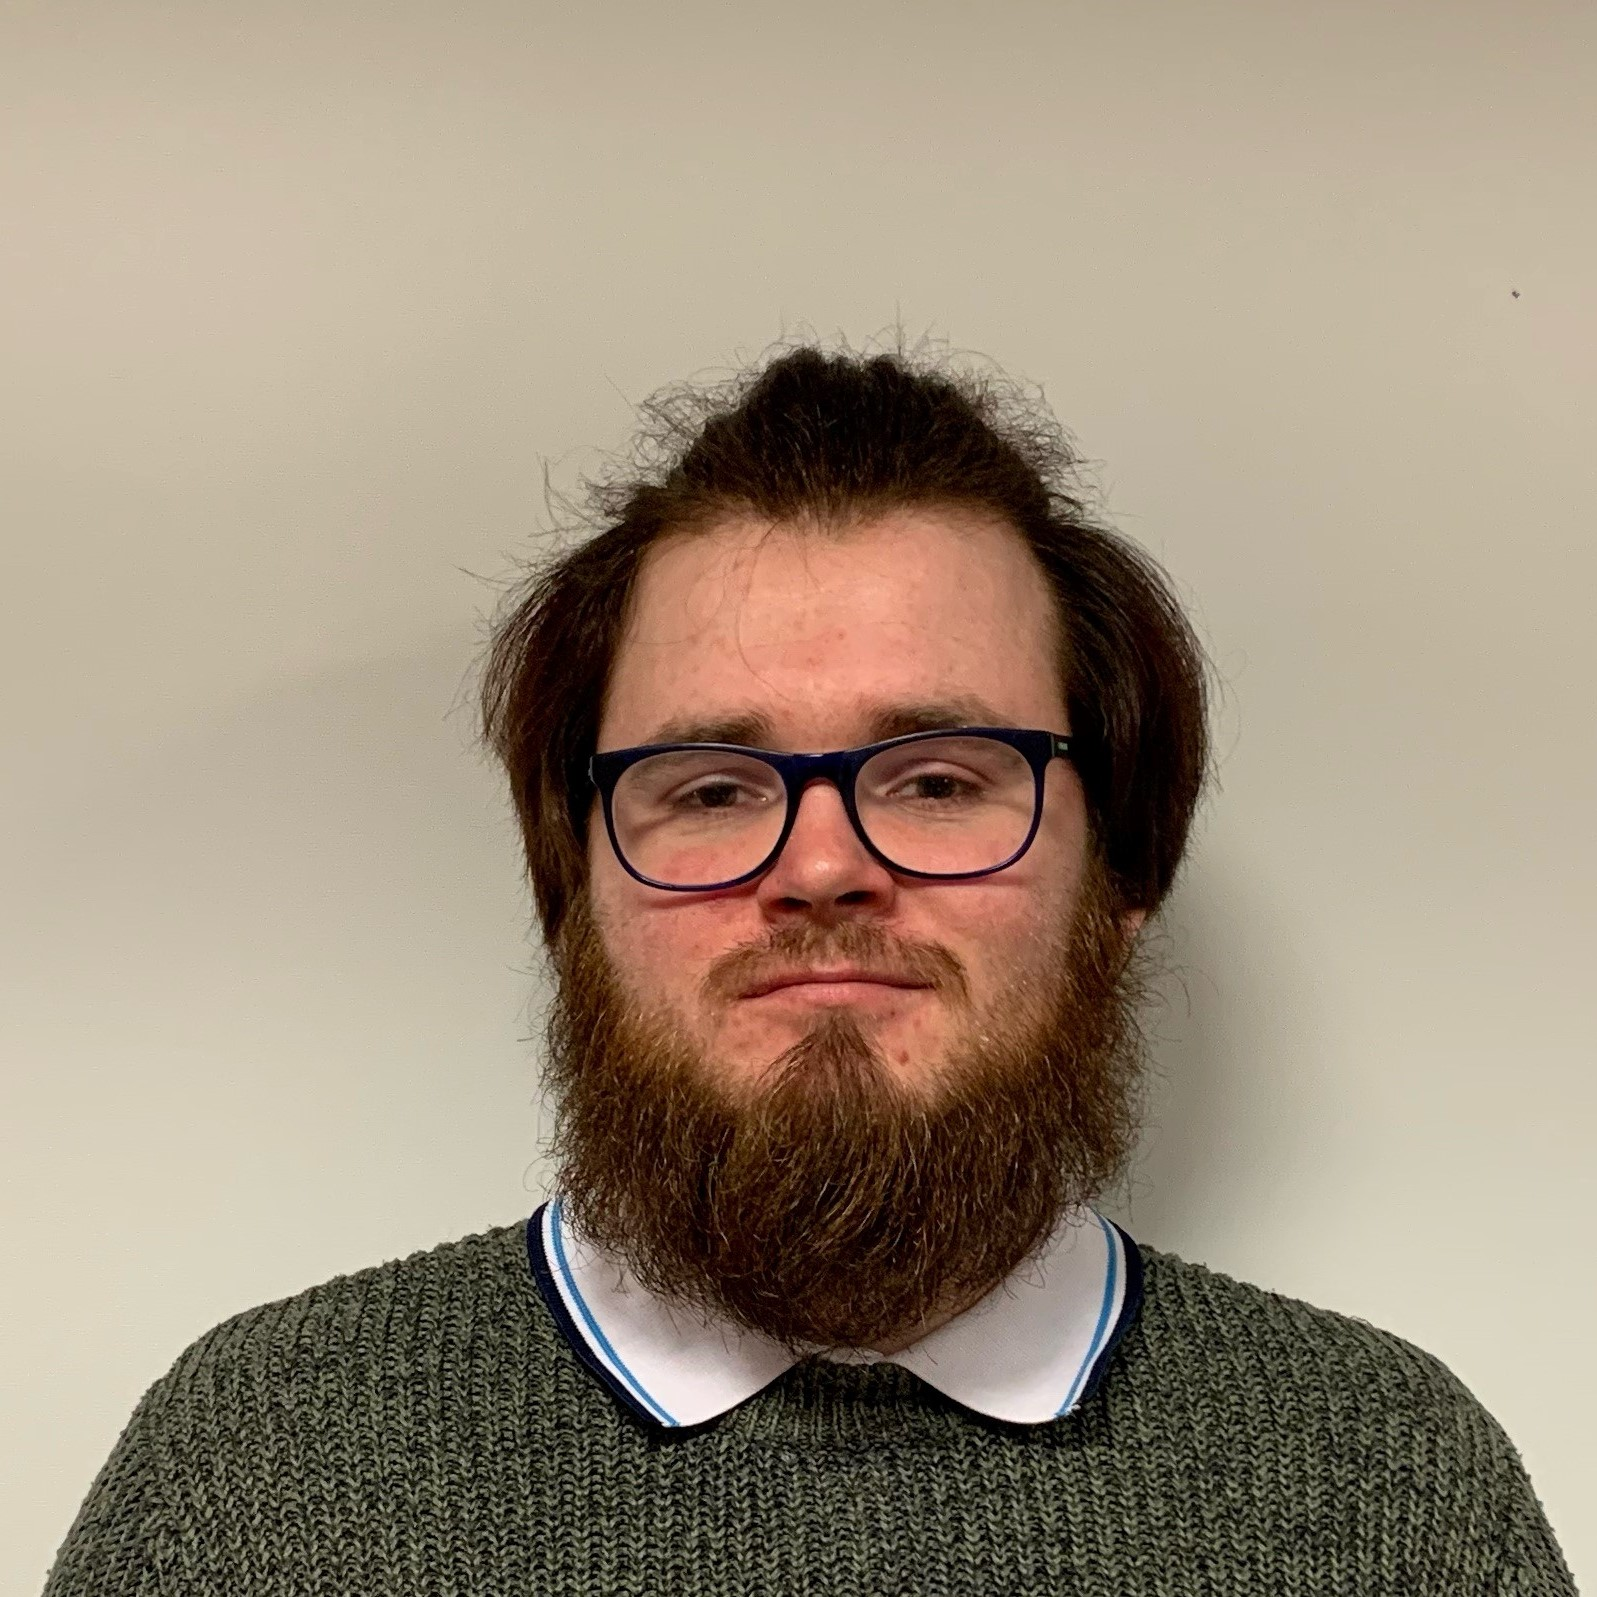 profile picture of matt baxter